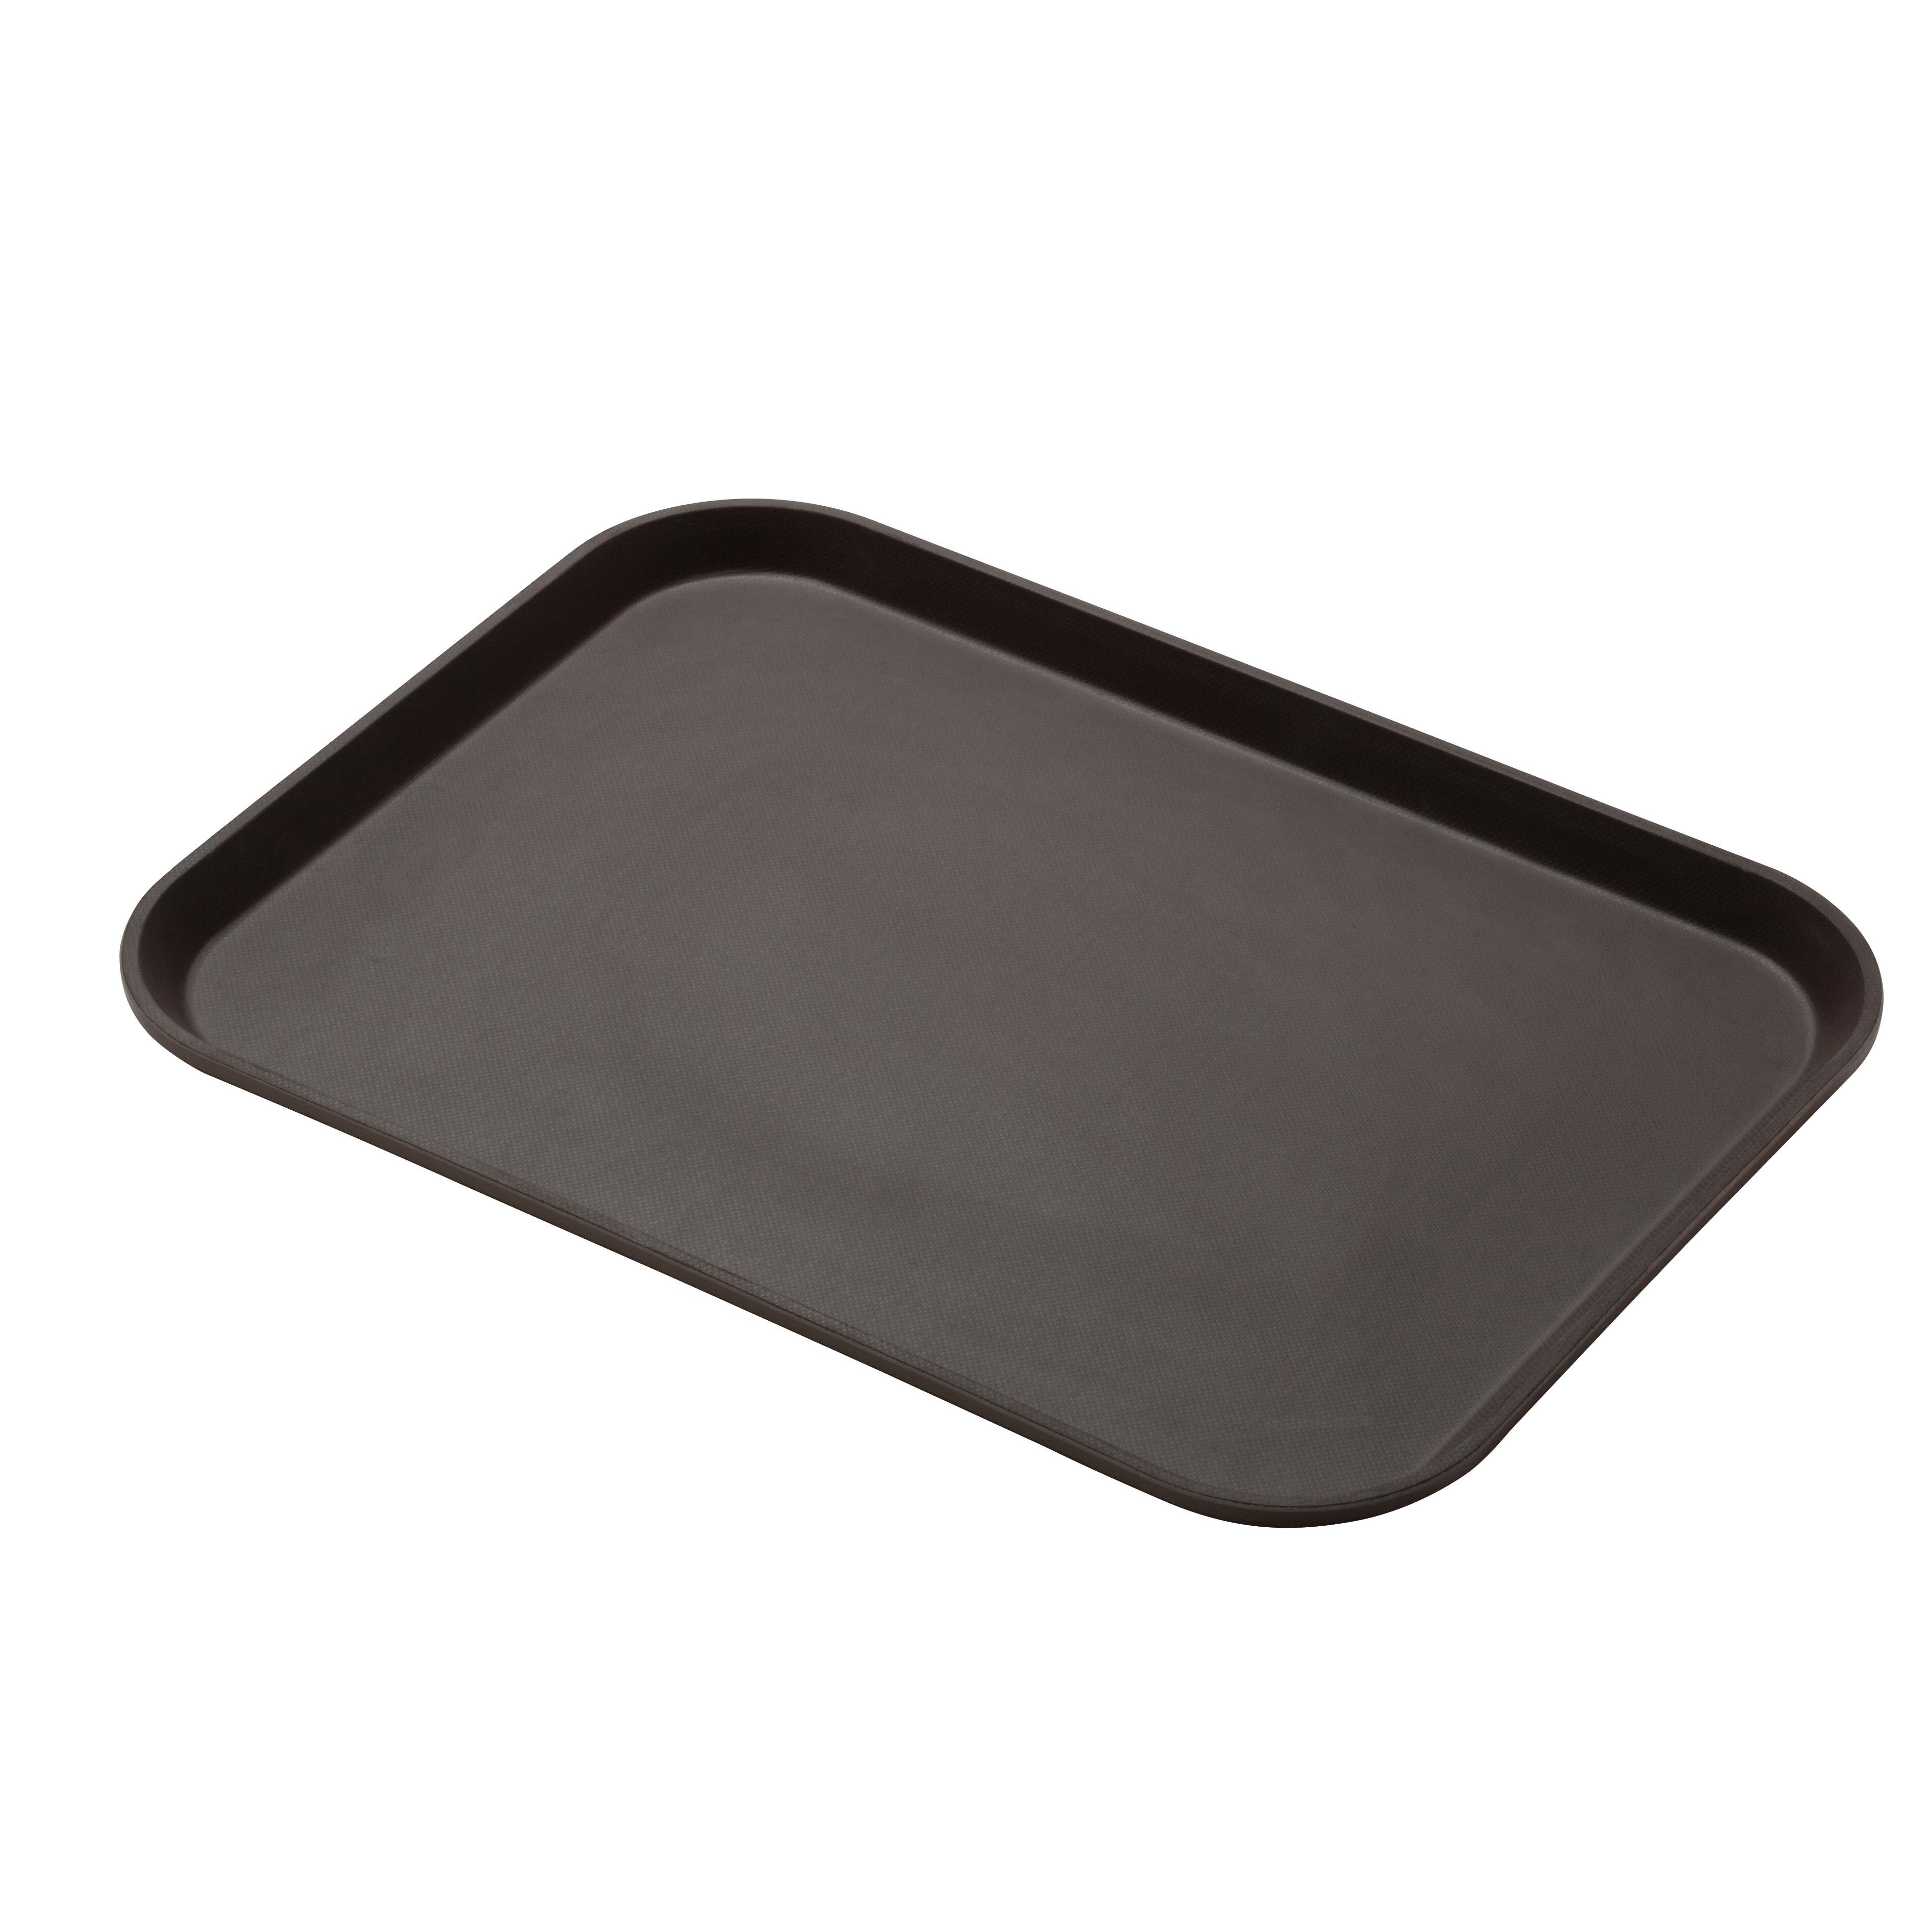 Cambro 3253CT138 serving tray, non-skid